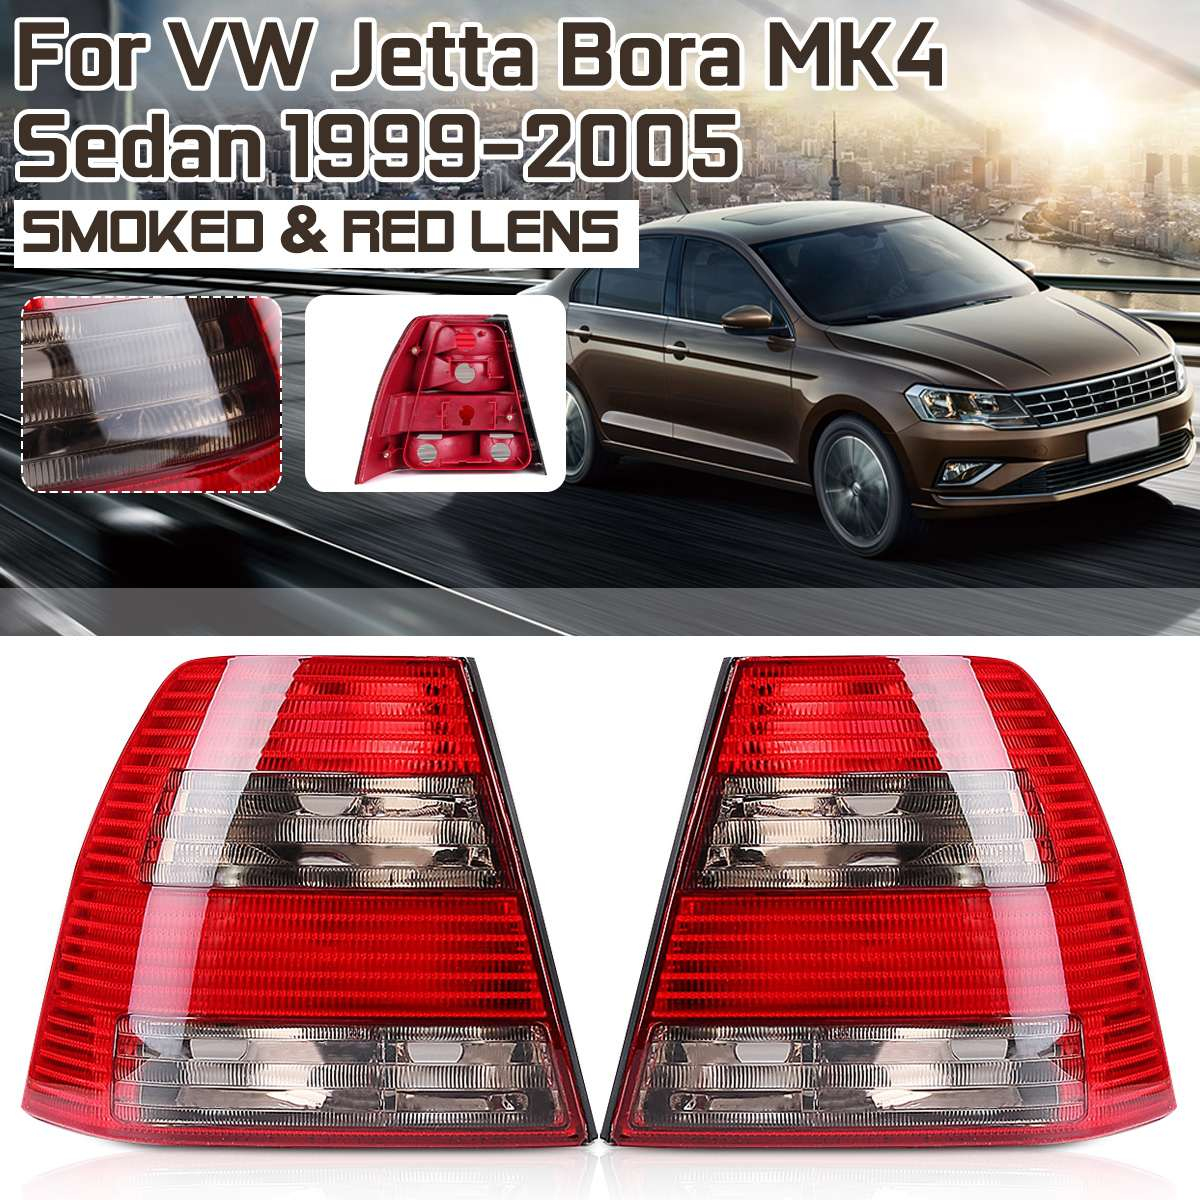 Feu arrière Pour Volkswagen Vw Jetta Bora MK4 Berline 1999 2000 2001 2002 2003-2005 Feu Arrière Arrière Lampe De Frein Accessoires